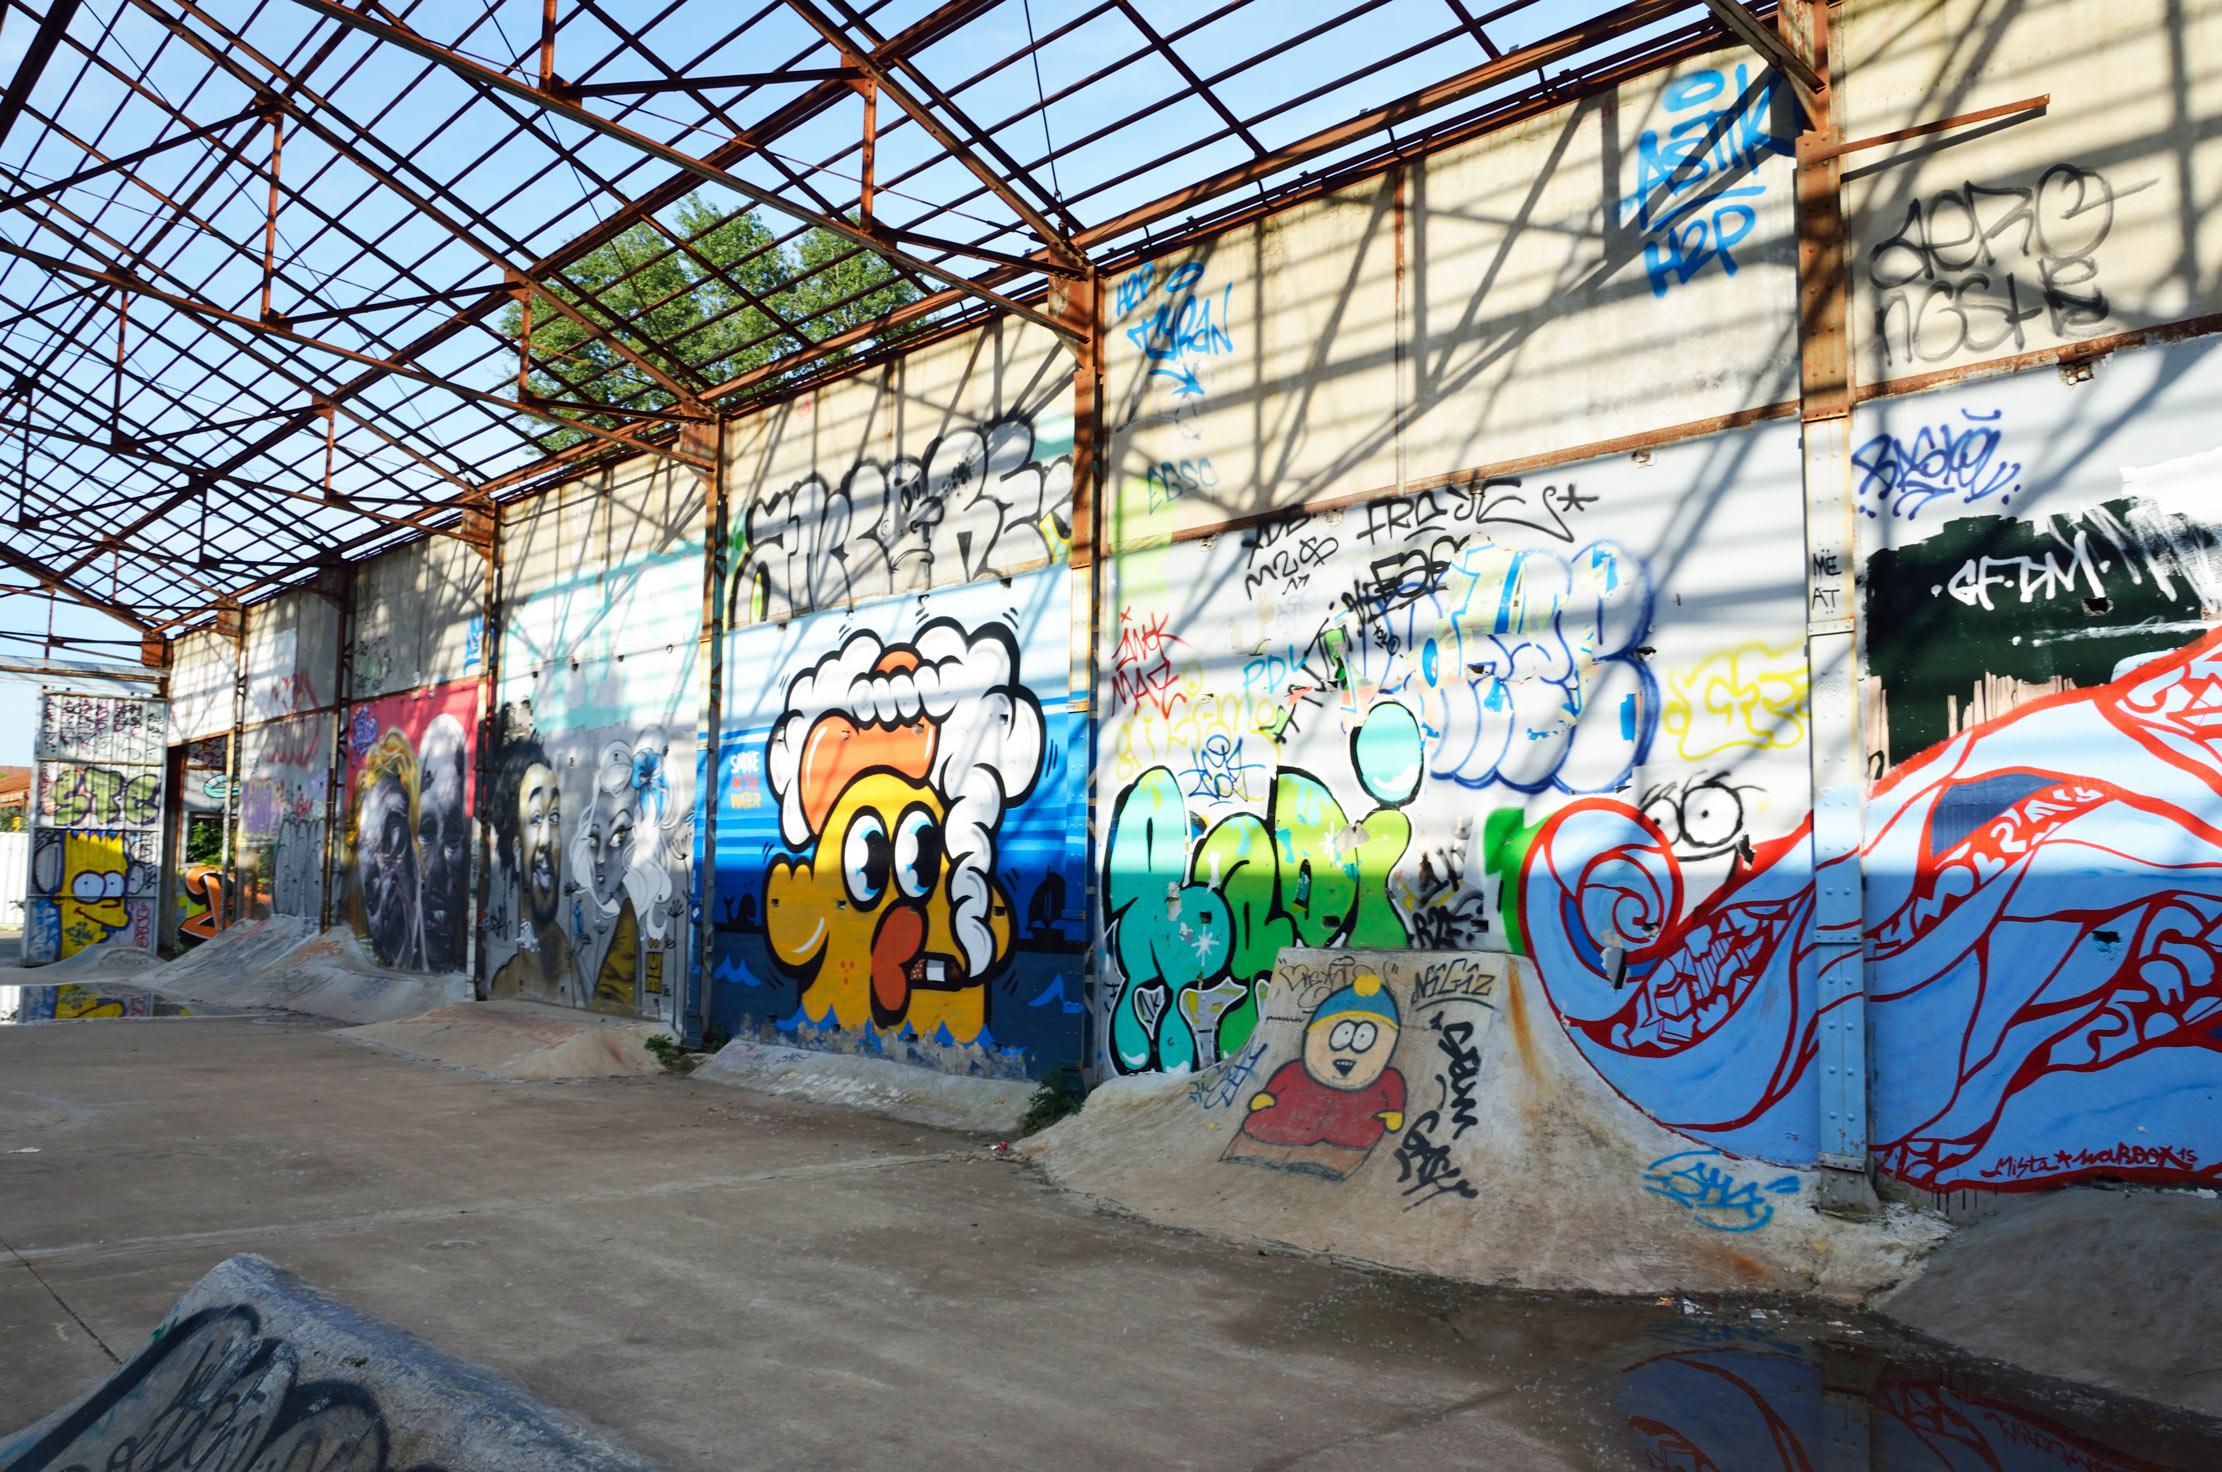 arte urbano Monsieur Poulet Burdeos, Francia